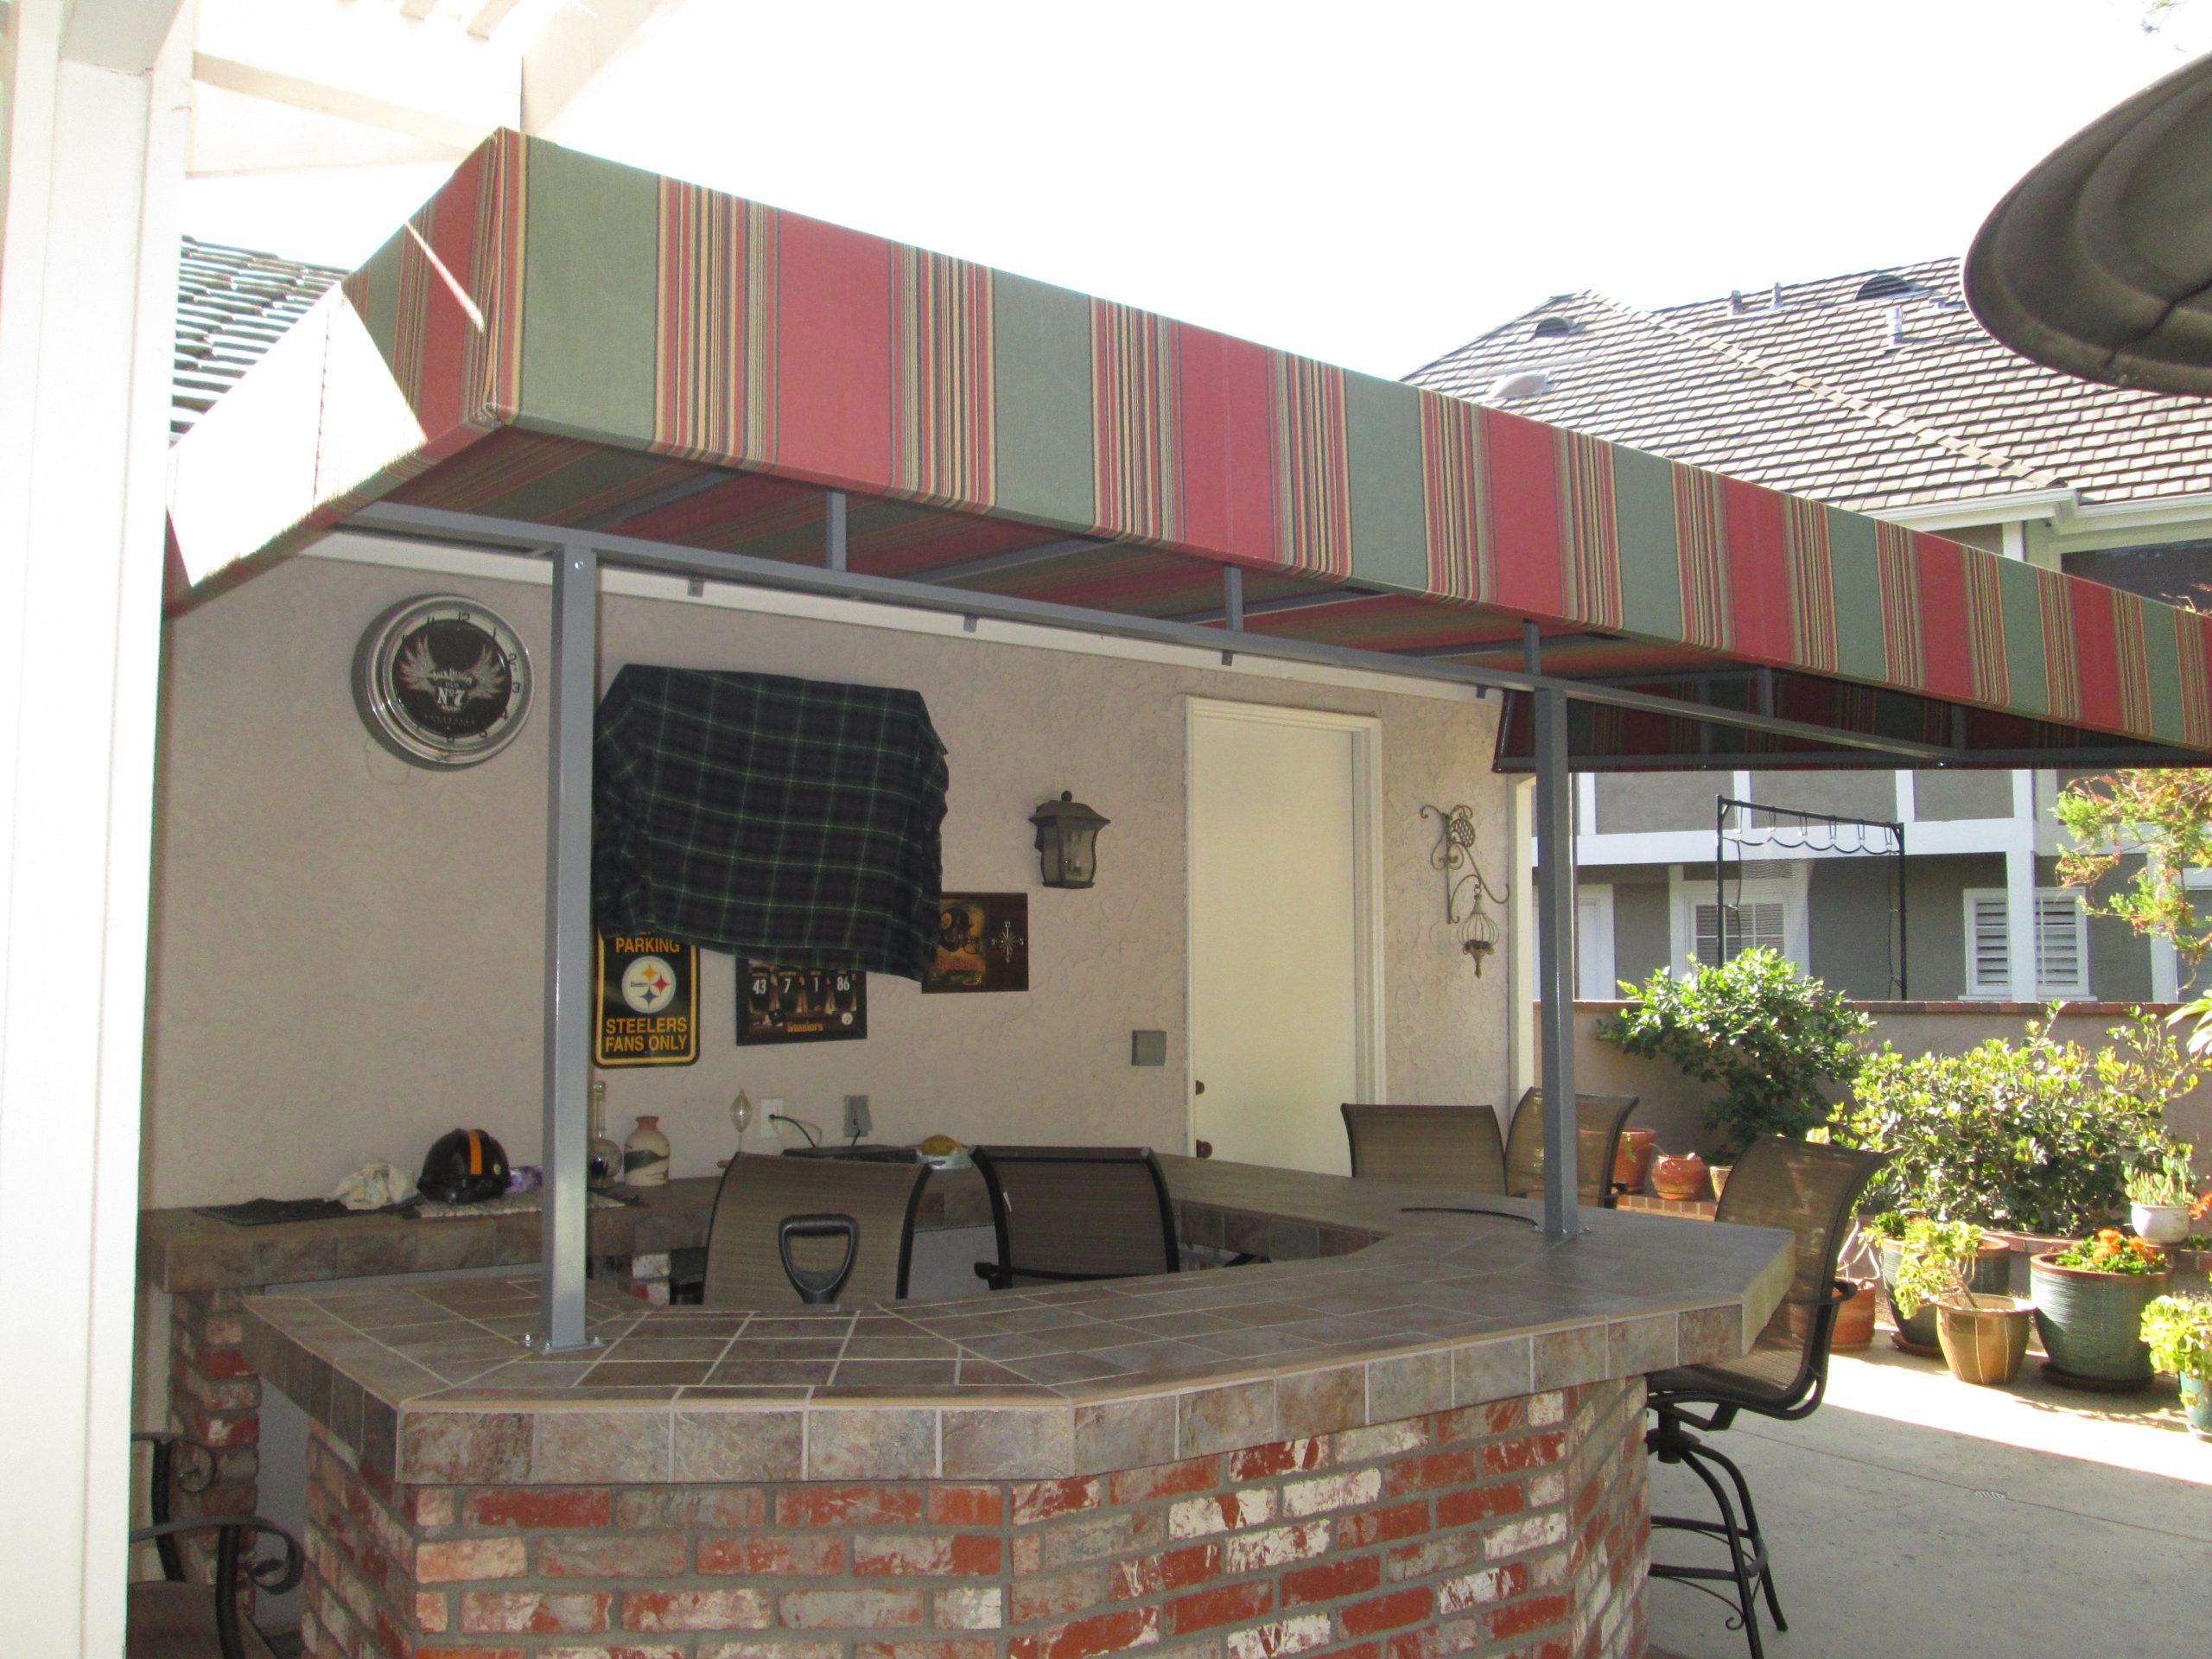 Residential Back Patio Cabana Install in California_6